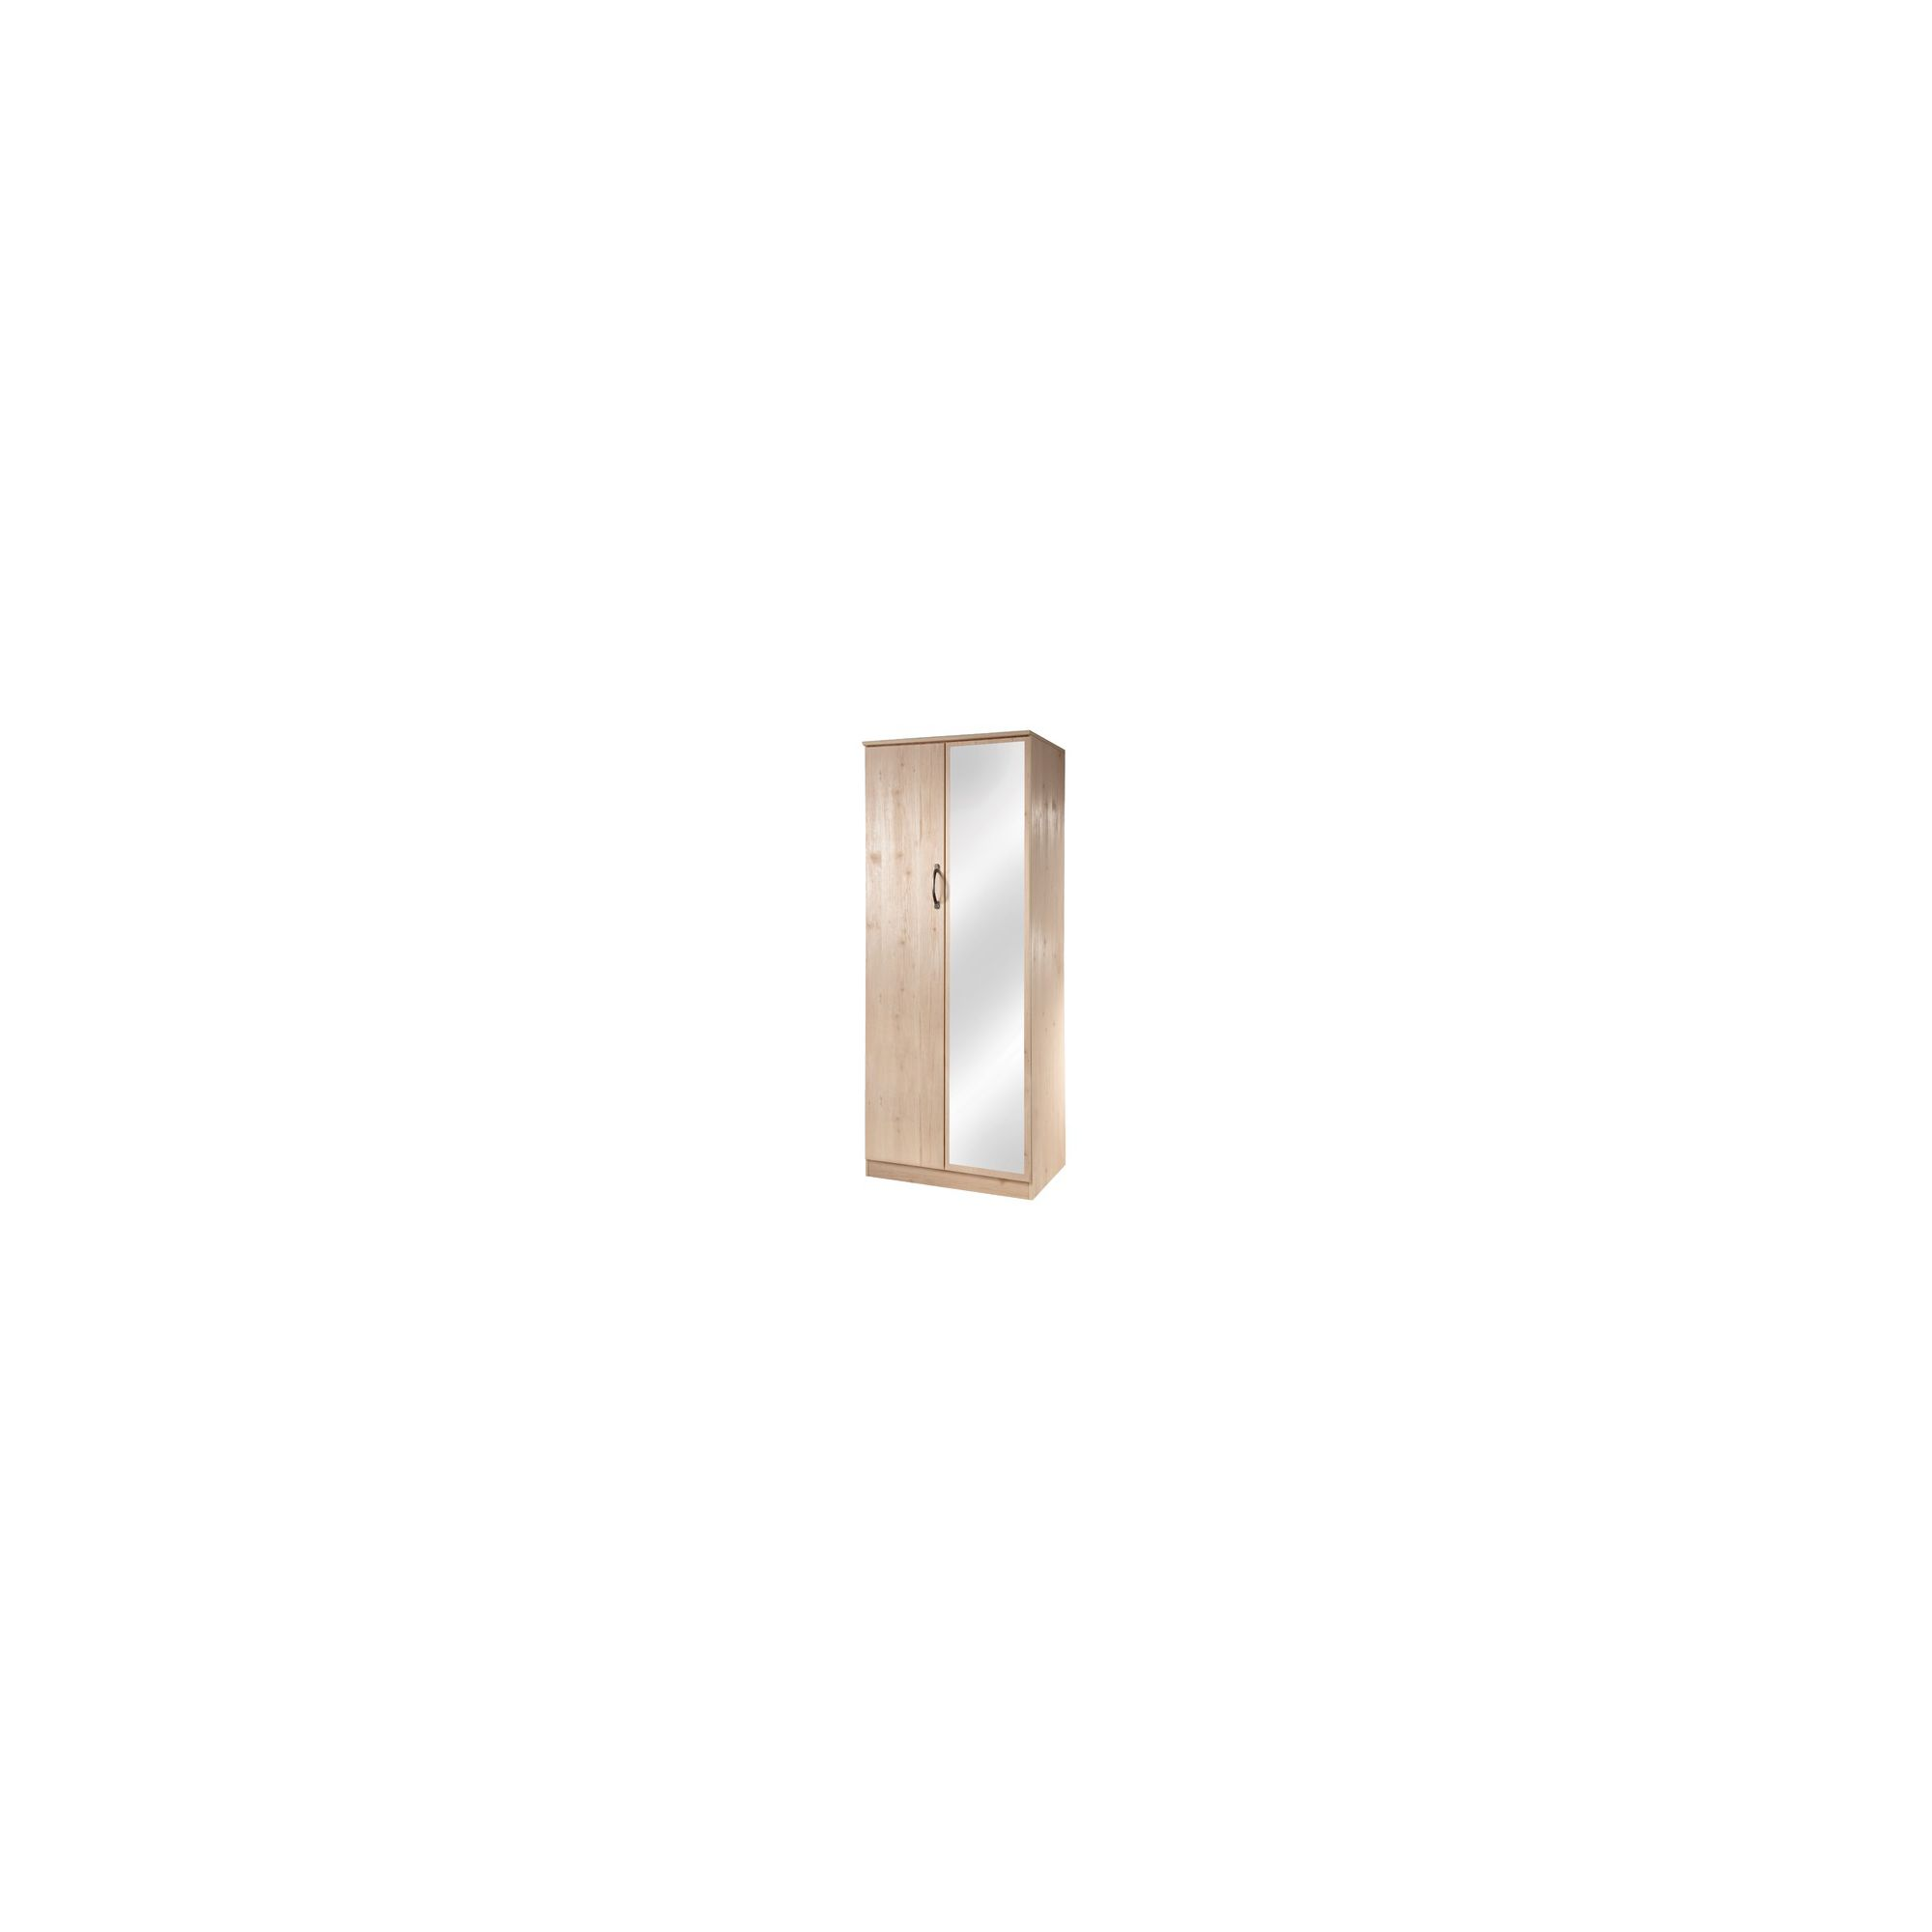 Welcome Furniture Florida Mirror Wardrobe - 197cm H at Tesco Direct